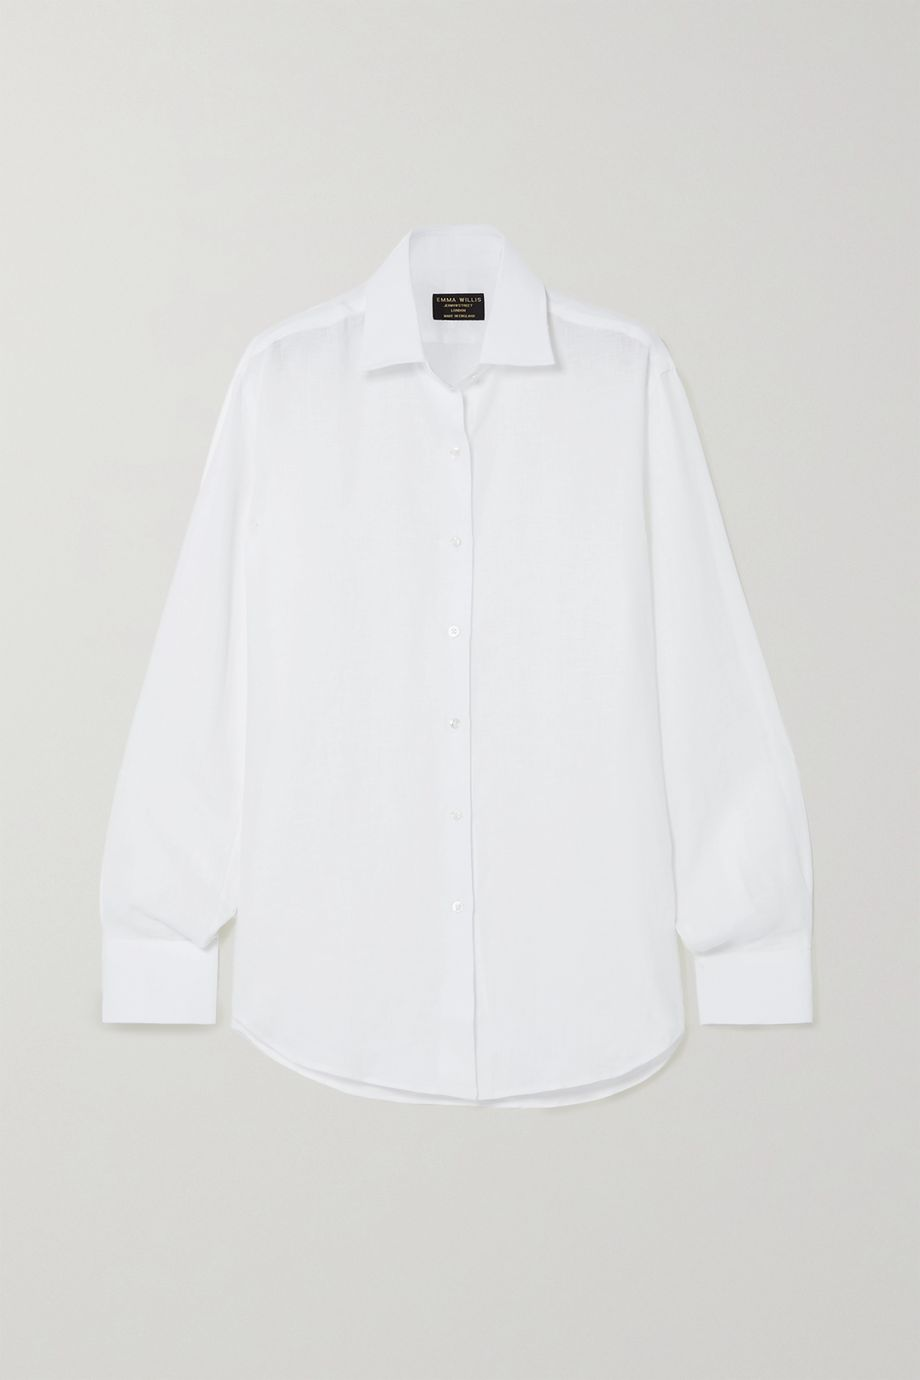 Emma Willis Jermyn Street Hemd aus Leinen